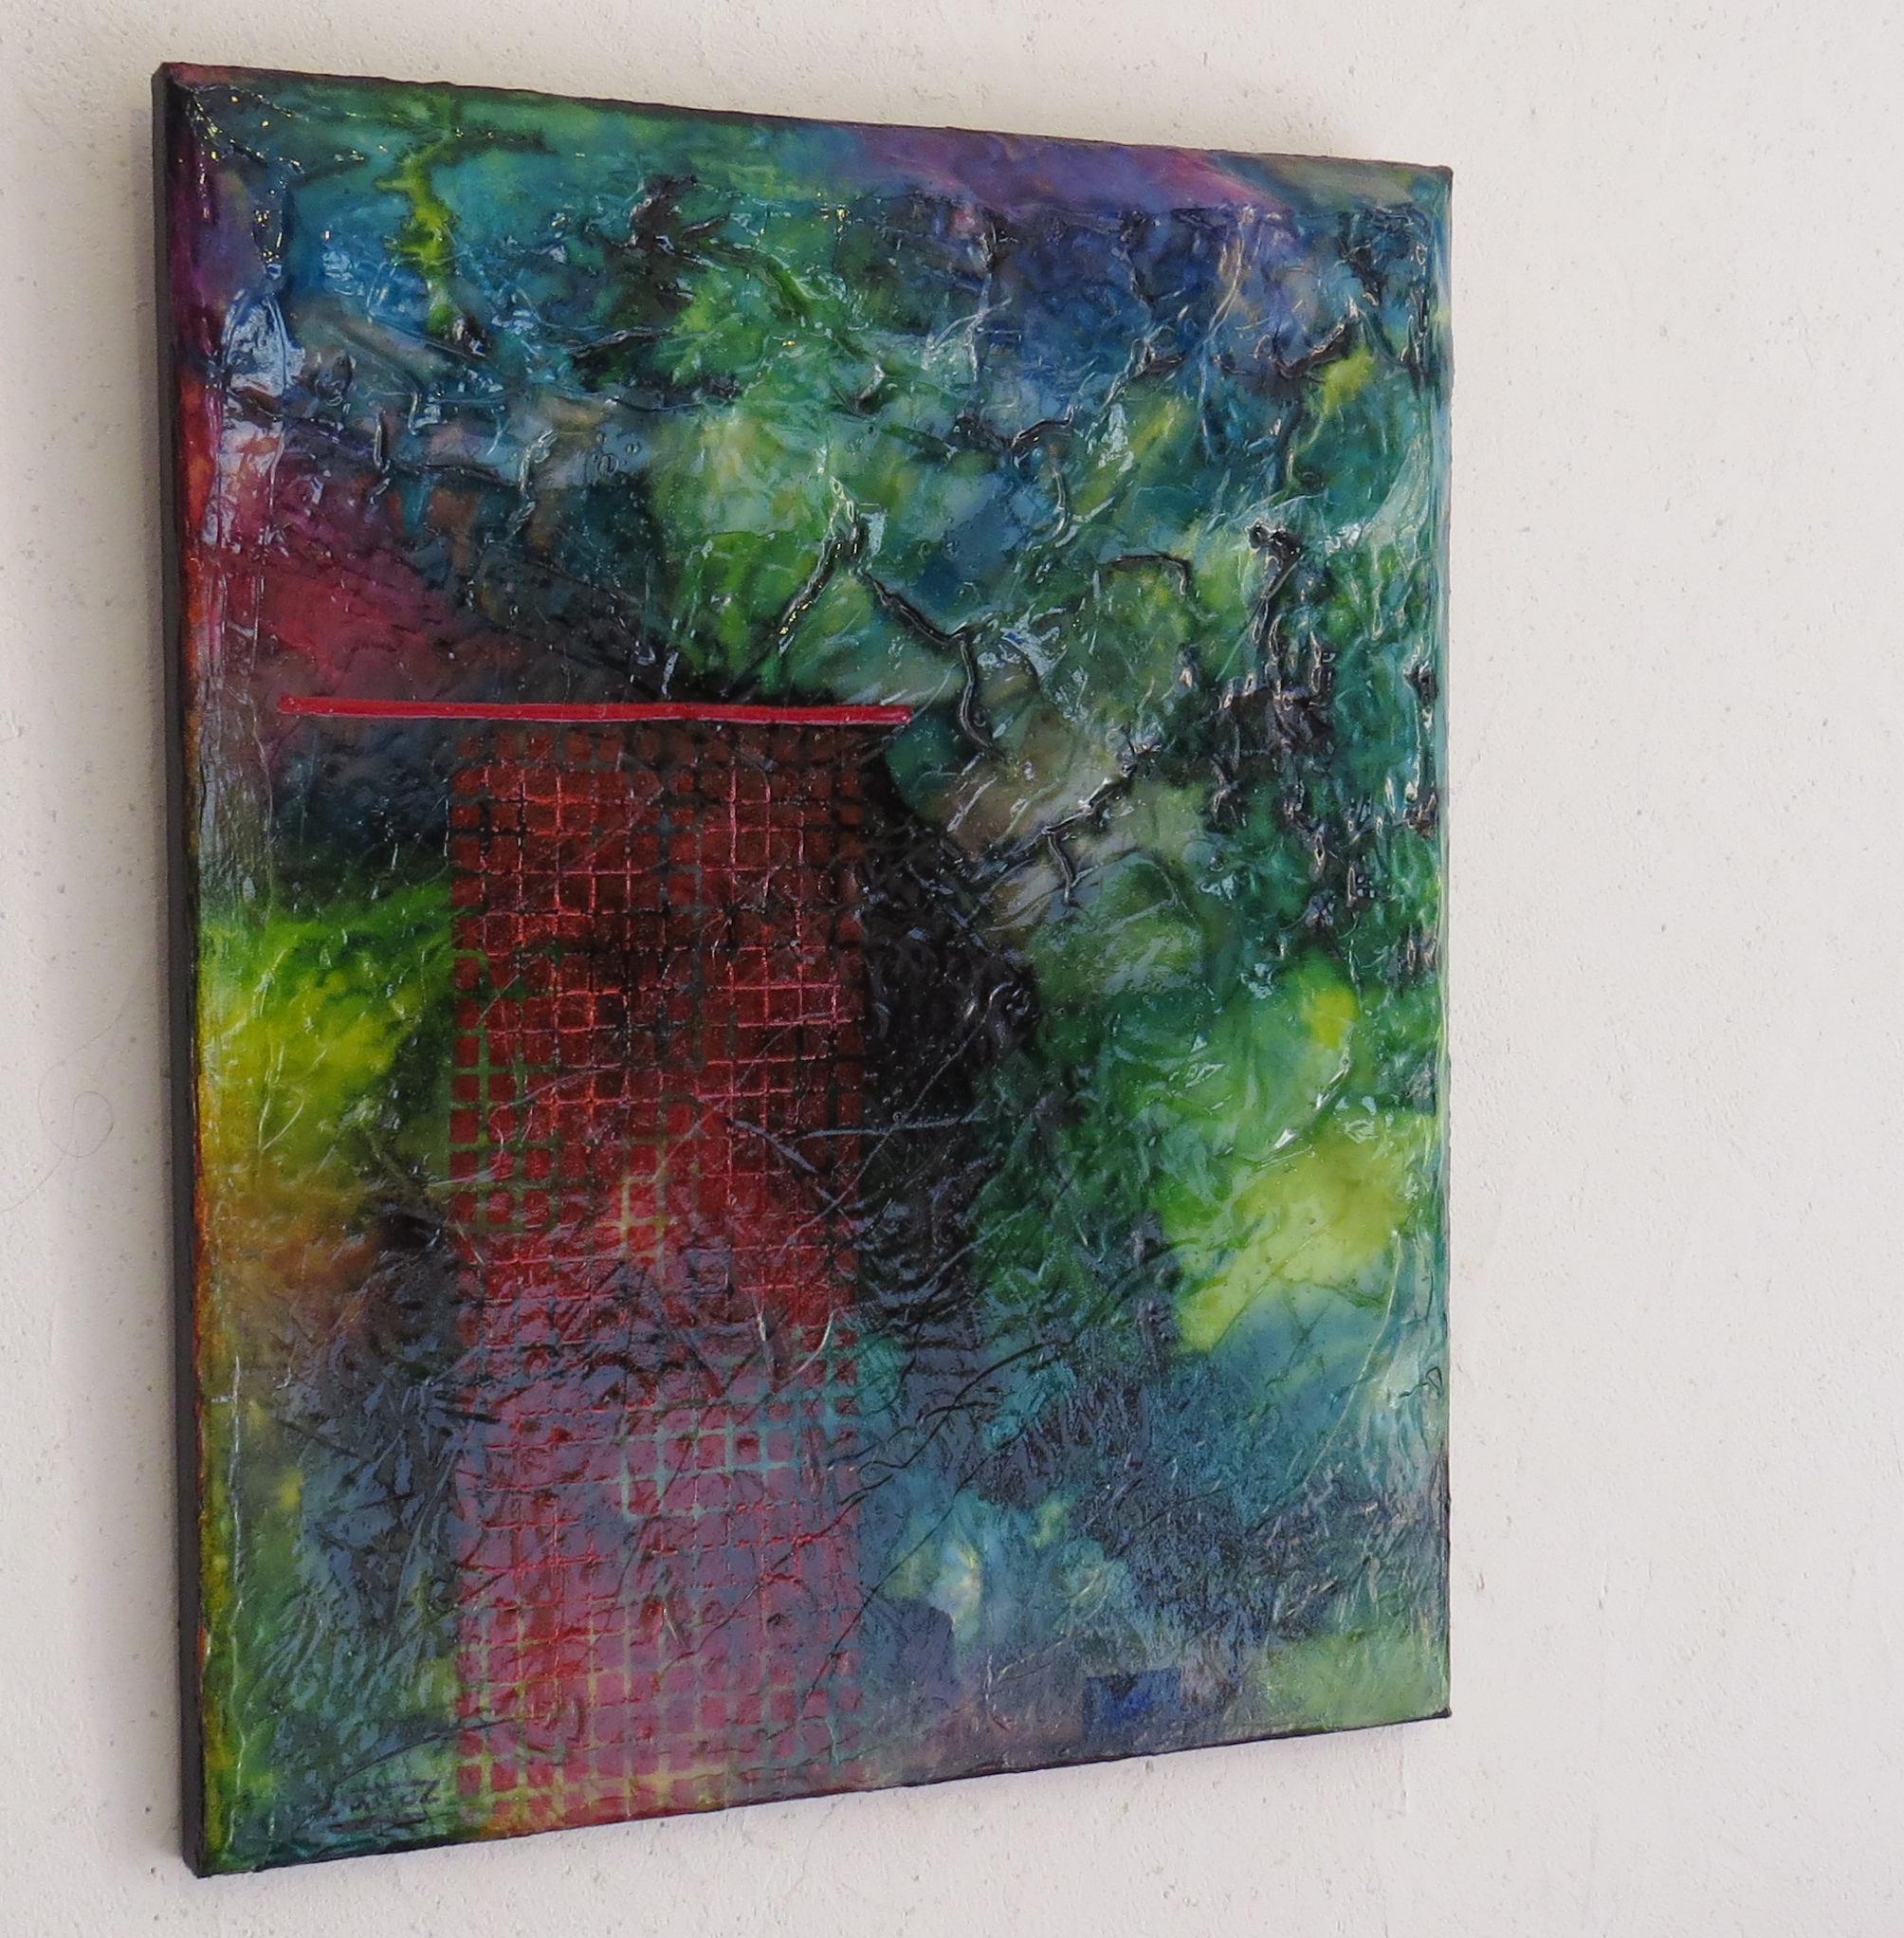 nimbes - vue côté1 - DALUZ GALEGO - peinture abstraite